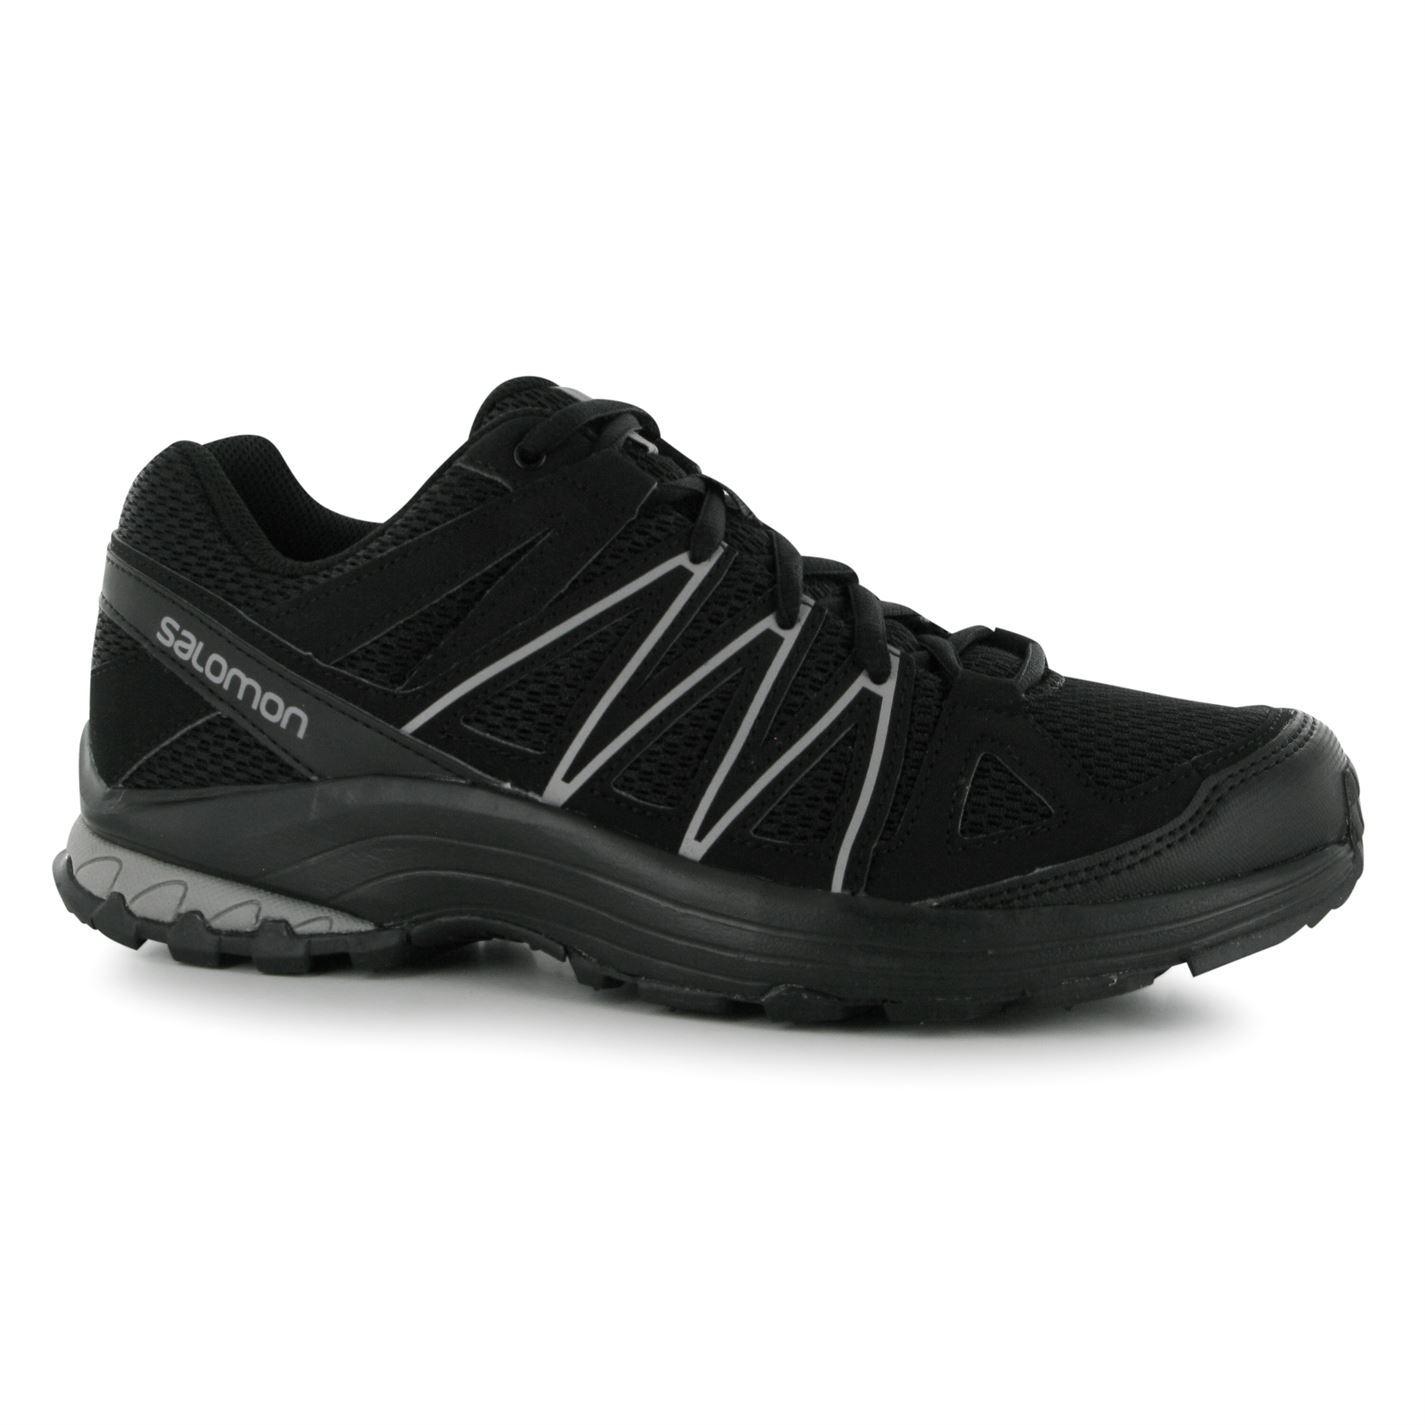 Detalles de Salomon Bondcliff Trail Running Zapatos Hombre Fitness Trote Zapatillas